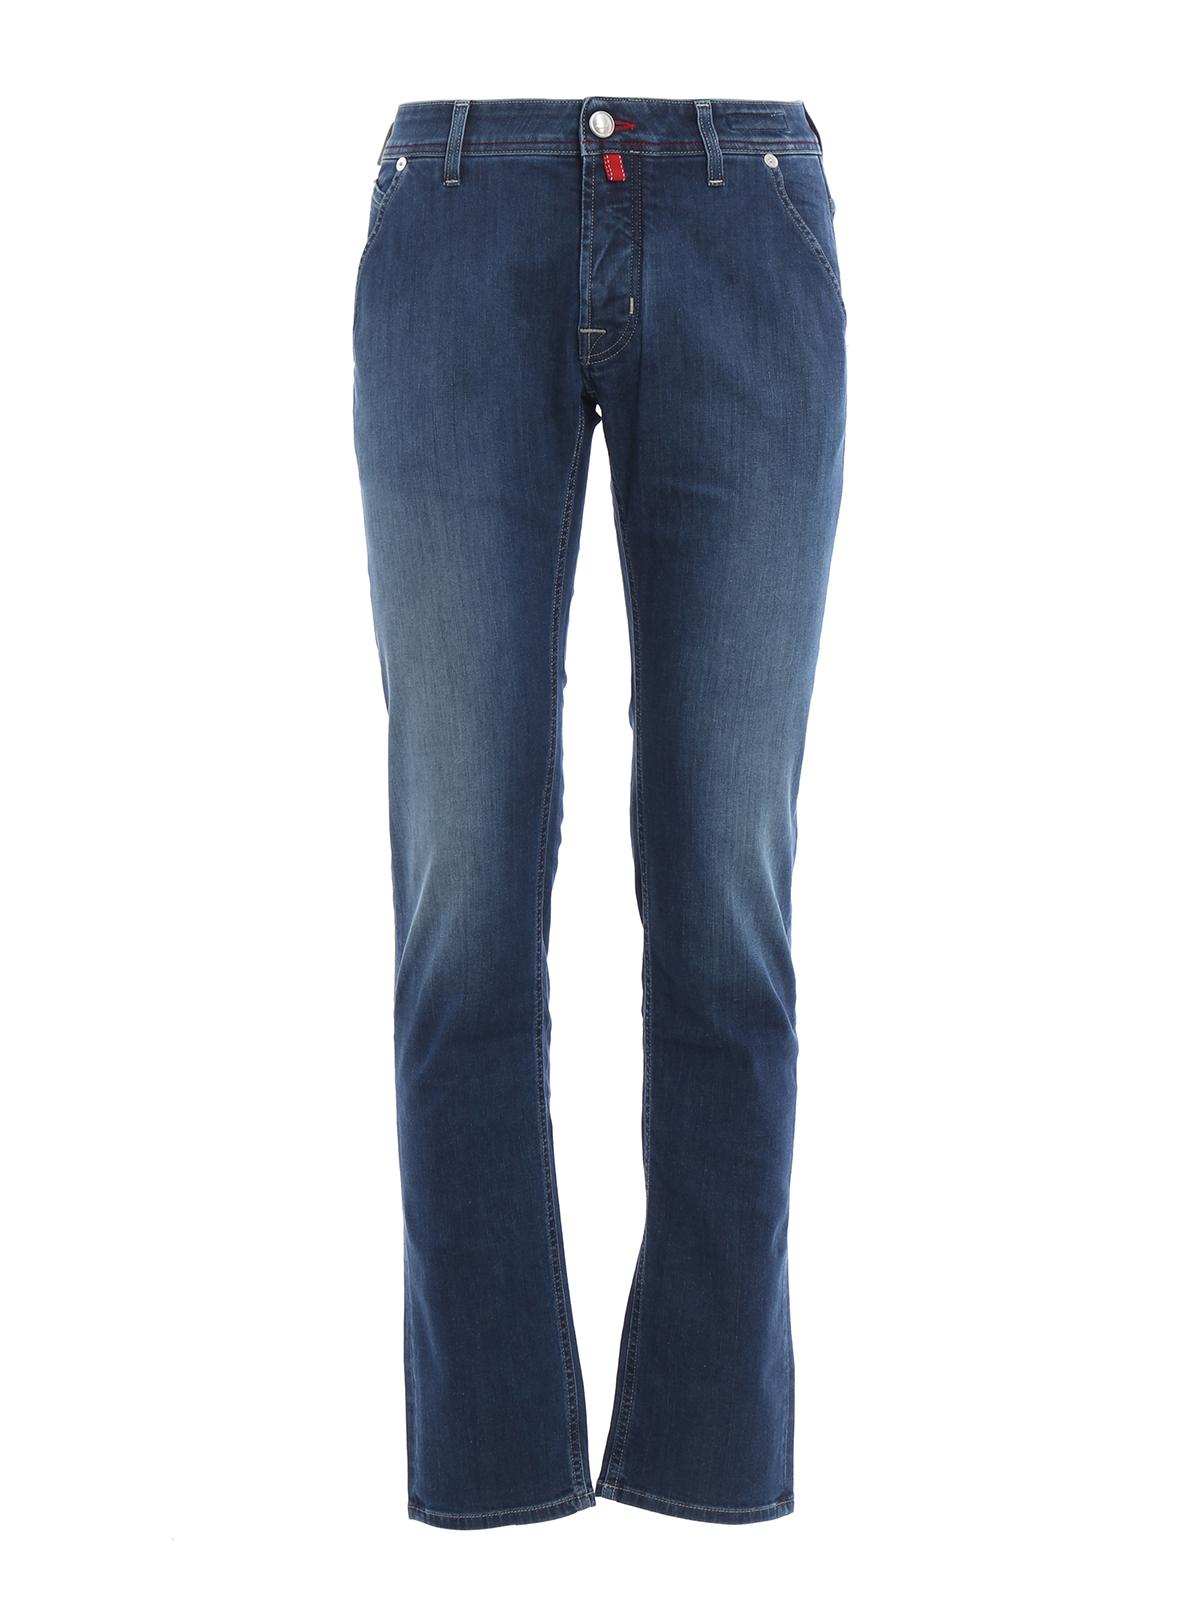 Pw613 comfortable faded jeans by jacob cohen straight - Jacob cohen denim ...